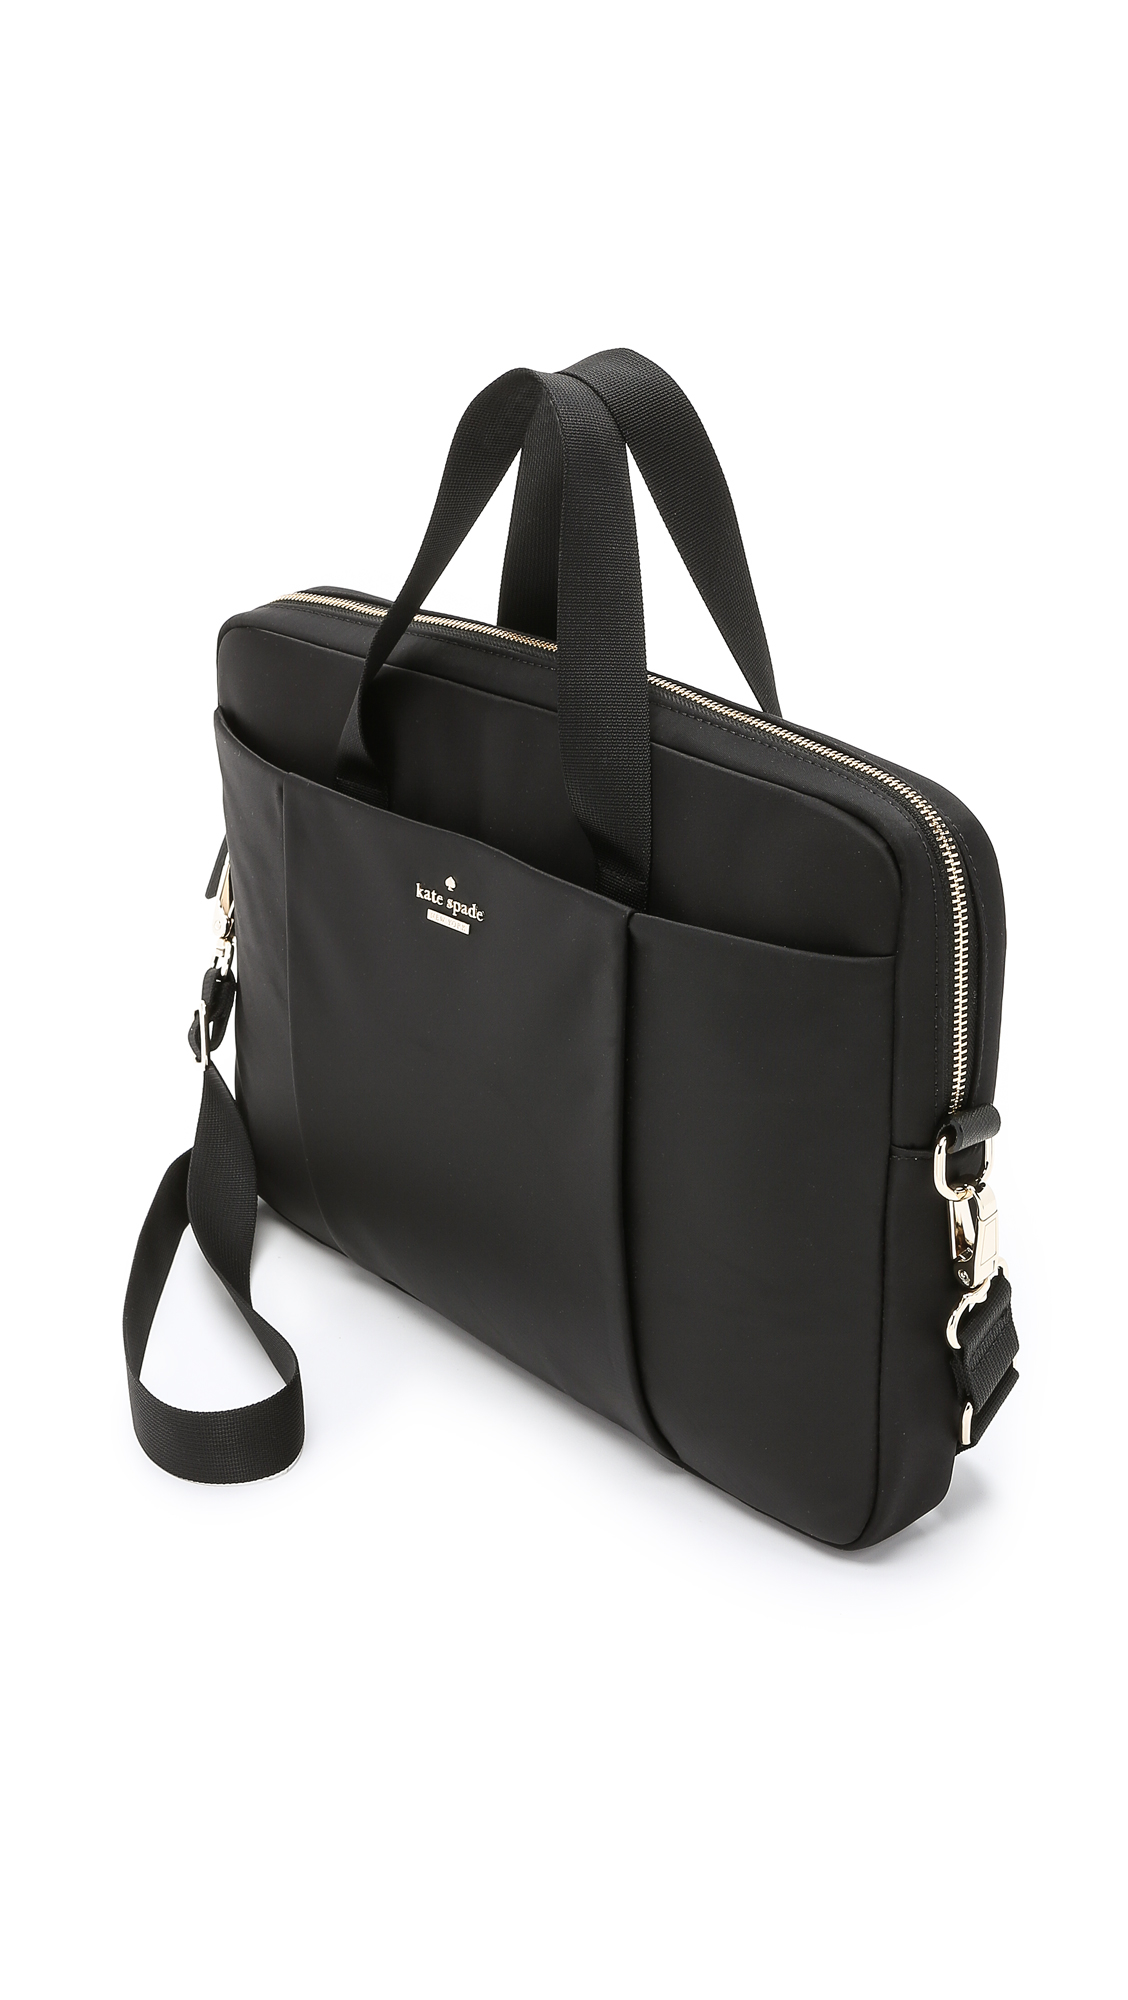 Rolf S Nyc Kate Spade New York Classic Nylon 15 Quot Laptop Case Black